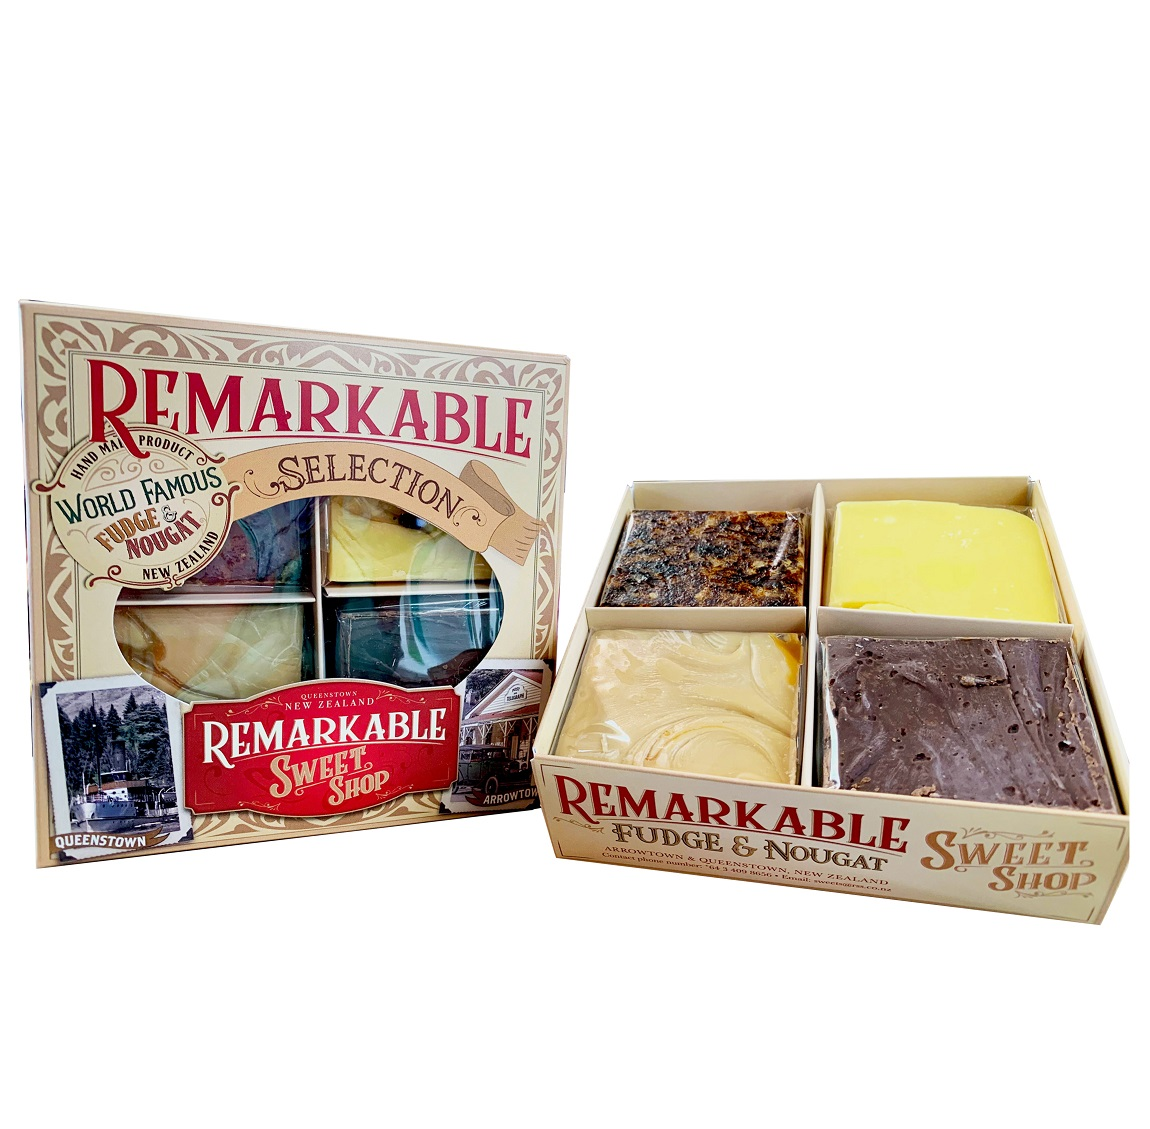 4 Piece Remarkable Fudge Gift Box